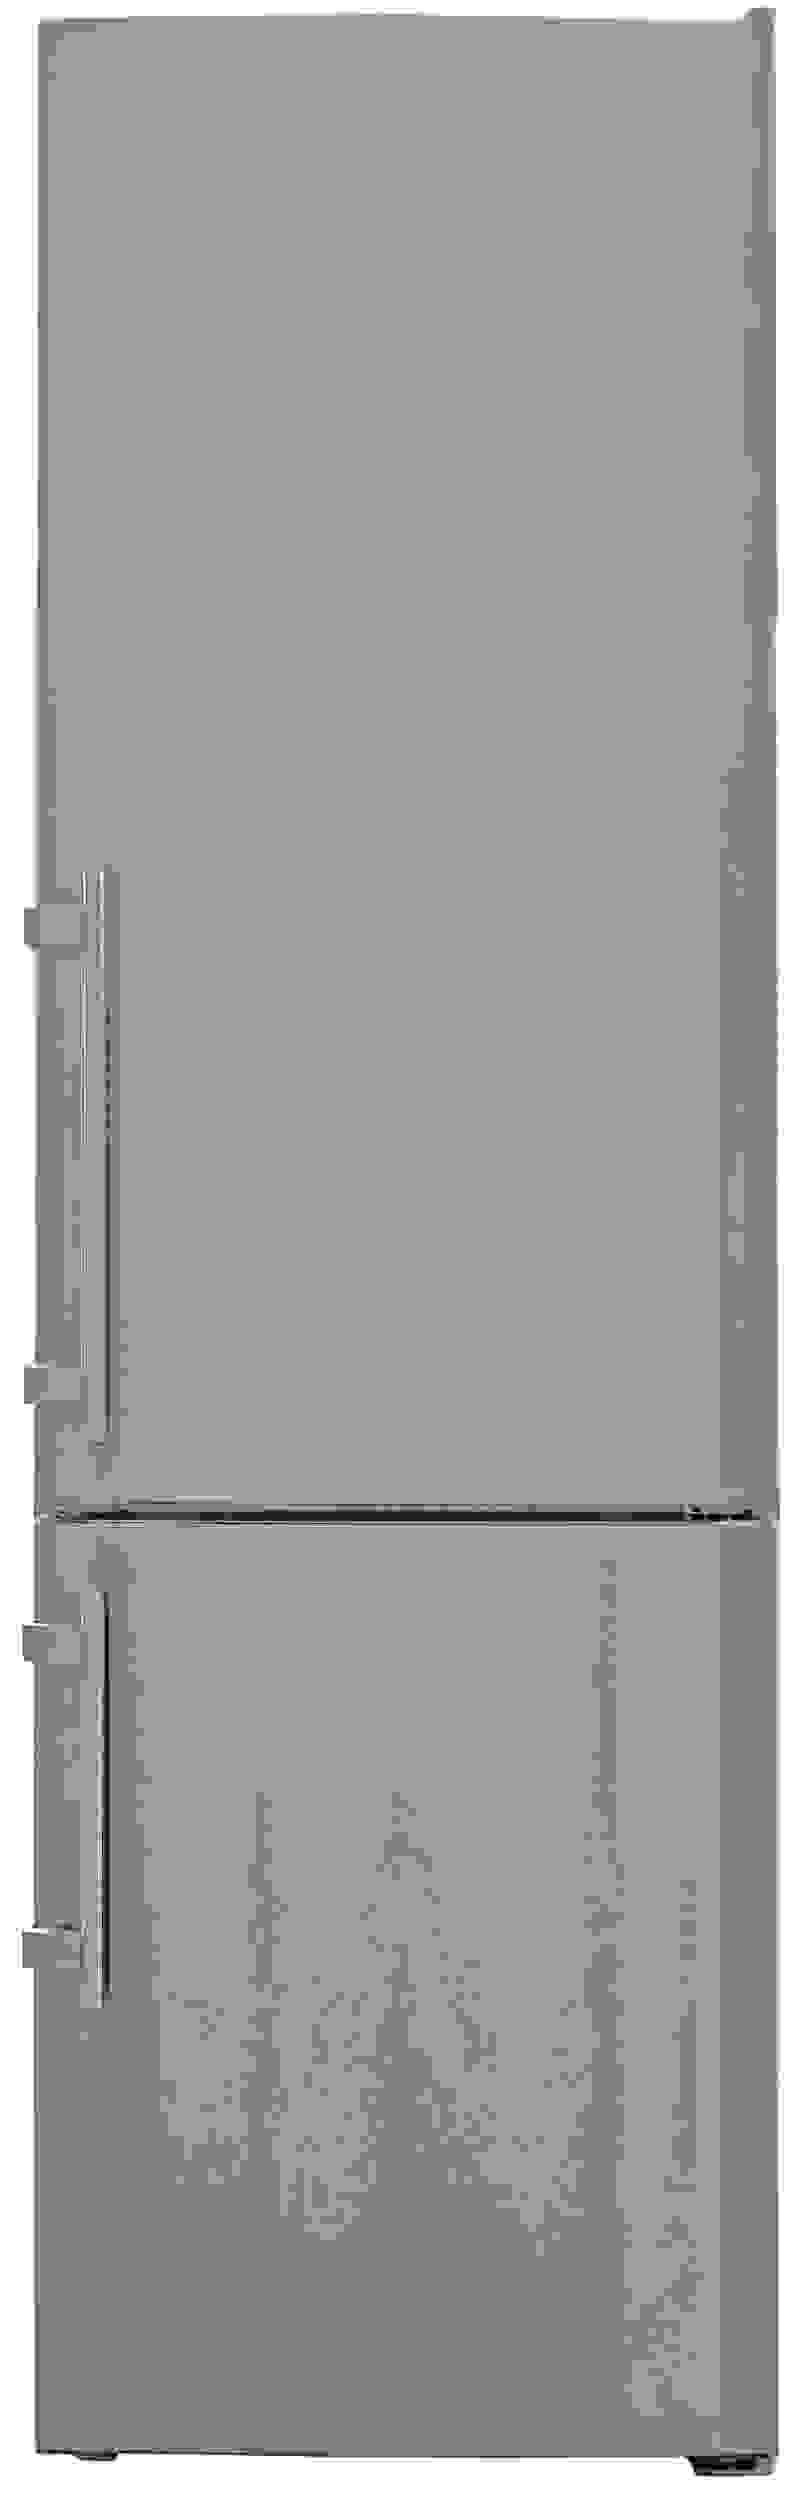 RFI-Liebherr-CS1360-vanity.jpg